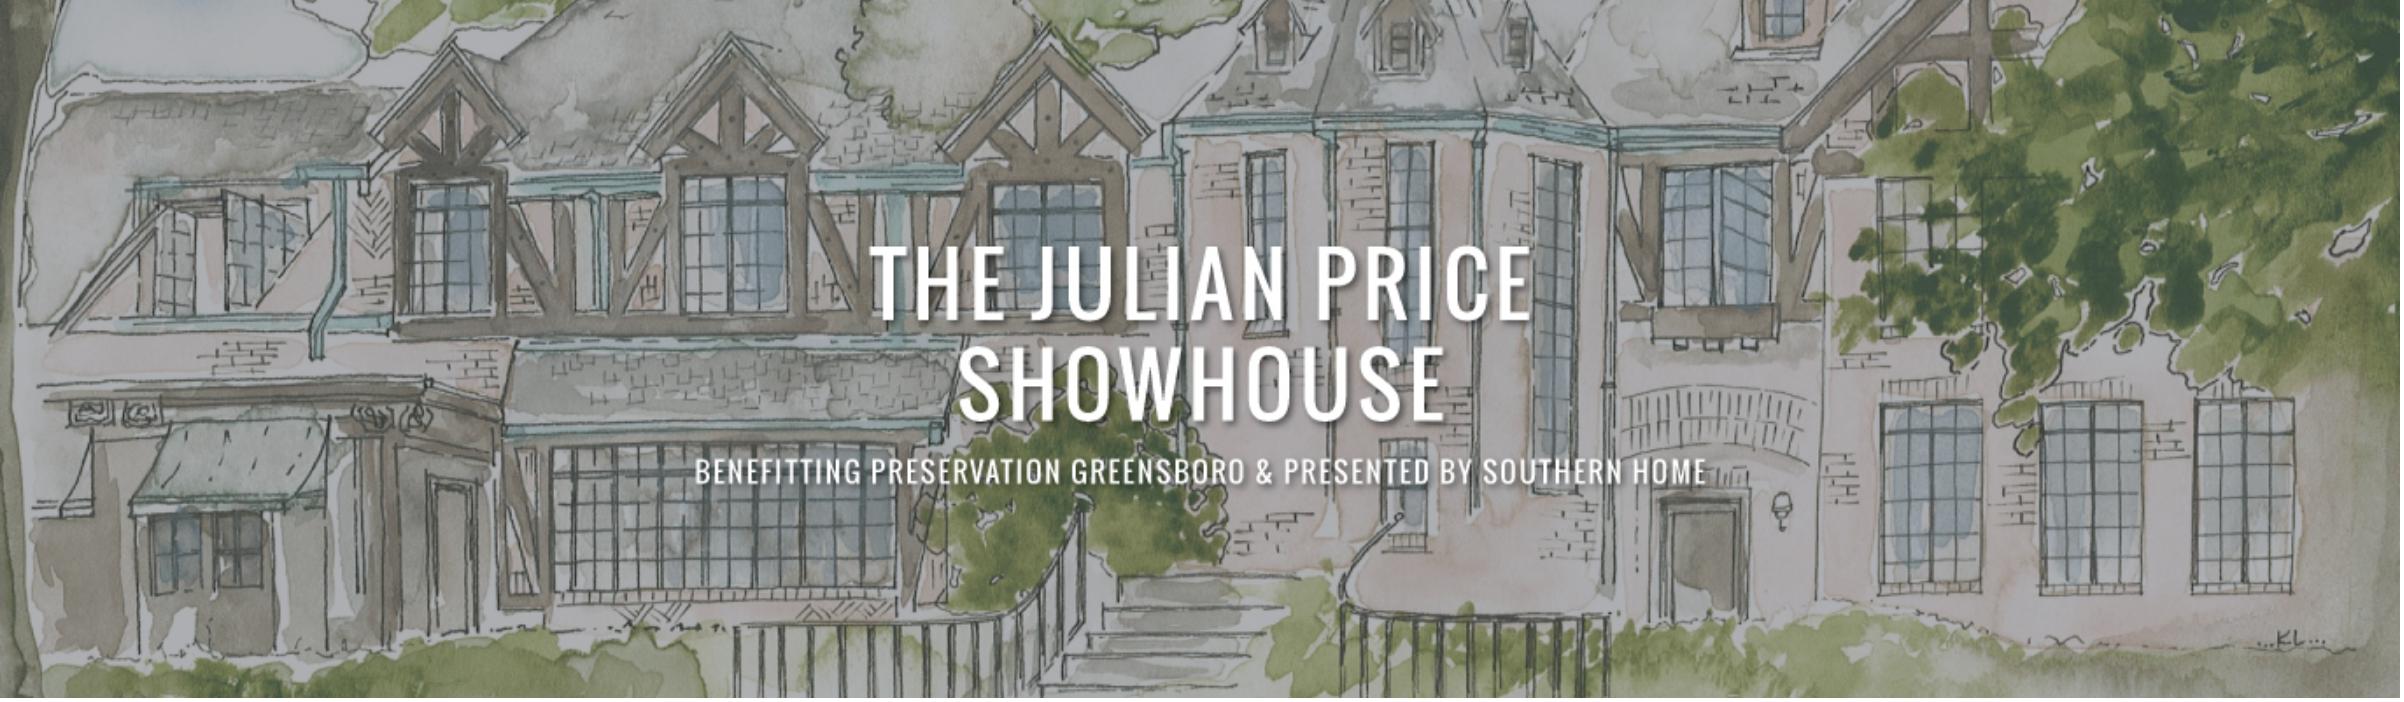 Julian Price Show house